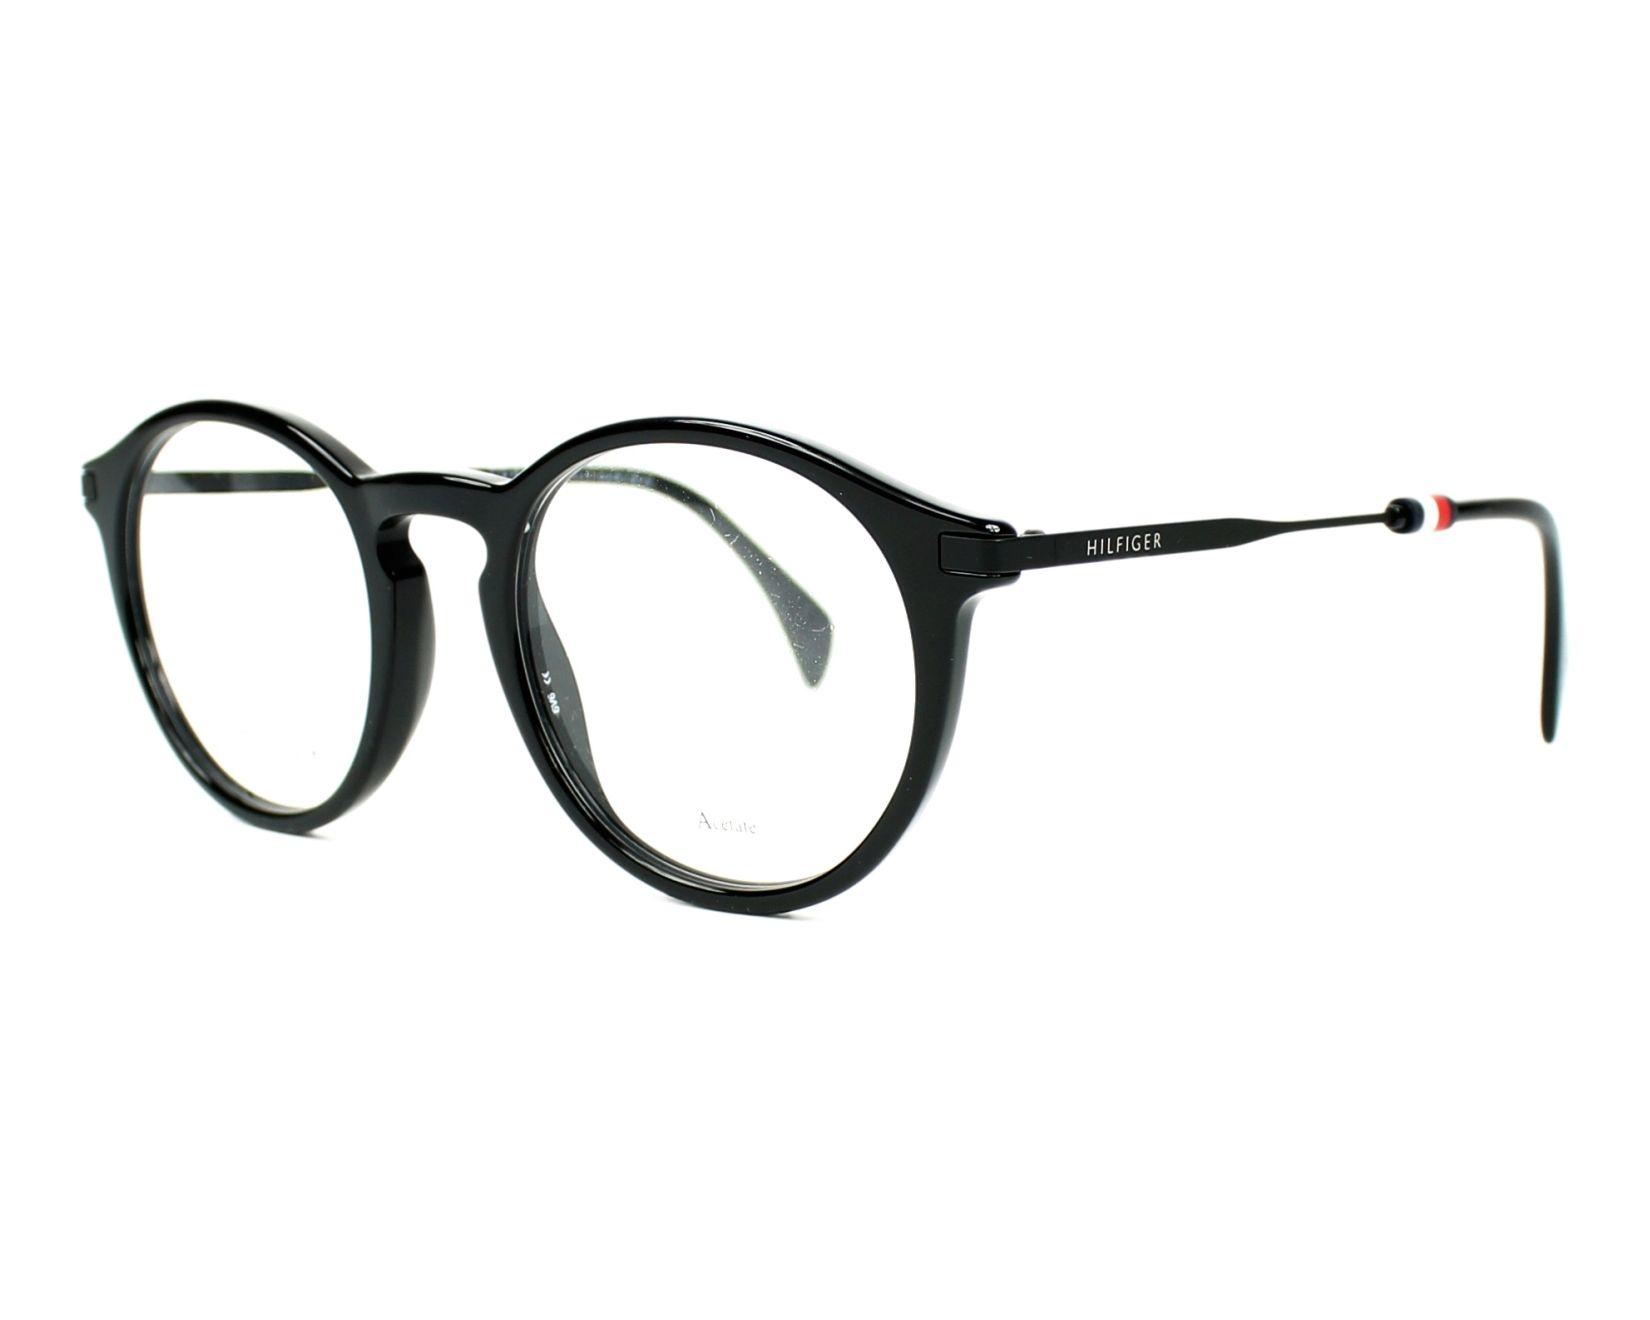 2c6229001c905 Get Free Shipping on Tommy Hilfiger Eyeglasses TH 1471 ...